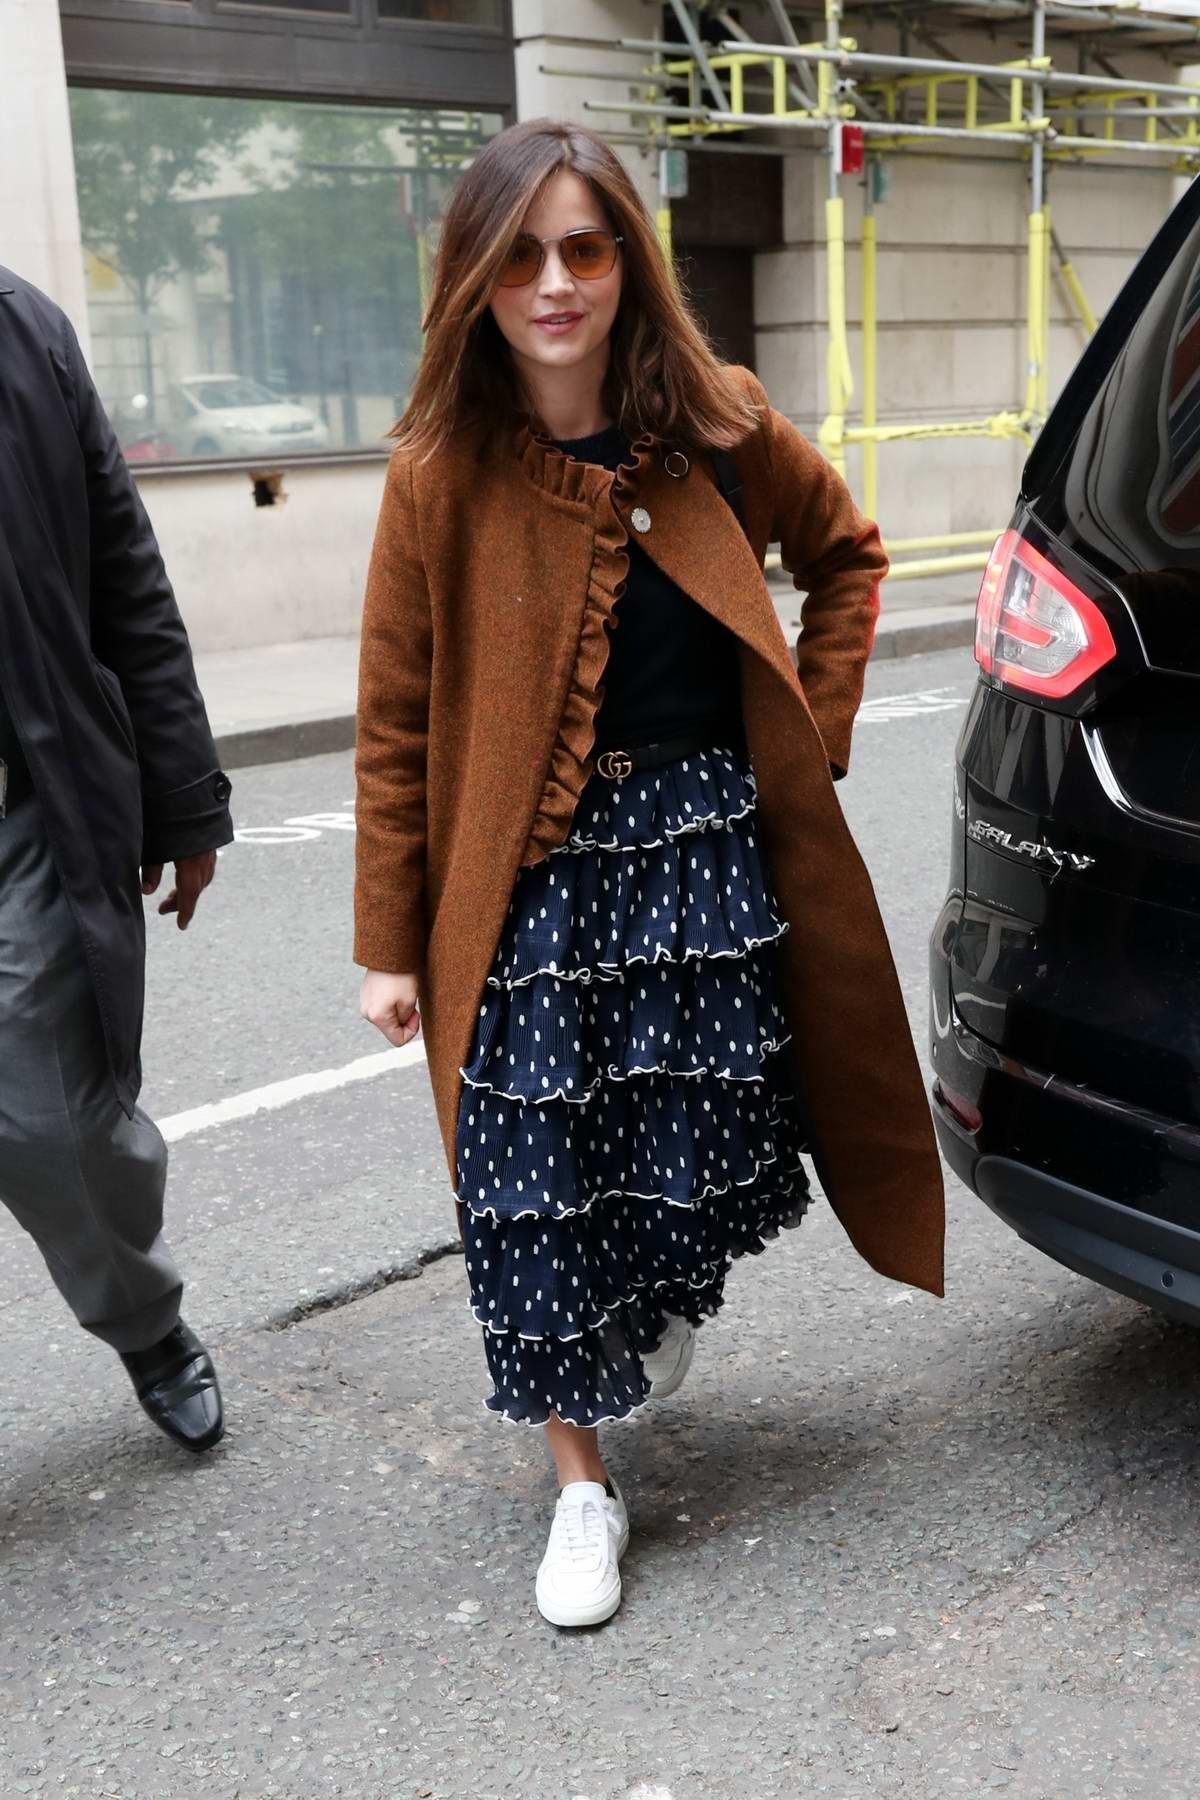 Jenna Coleman arrives for Graham Norton's Radio 2 show in London, UK